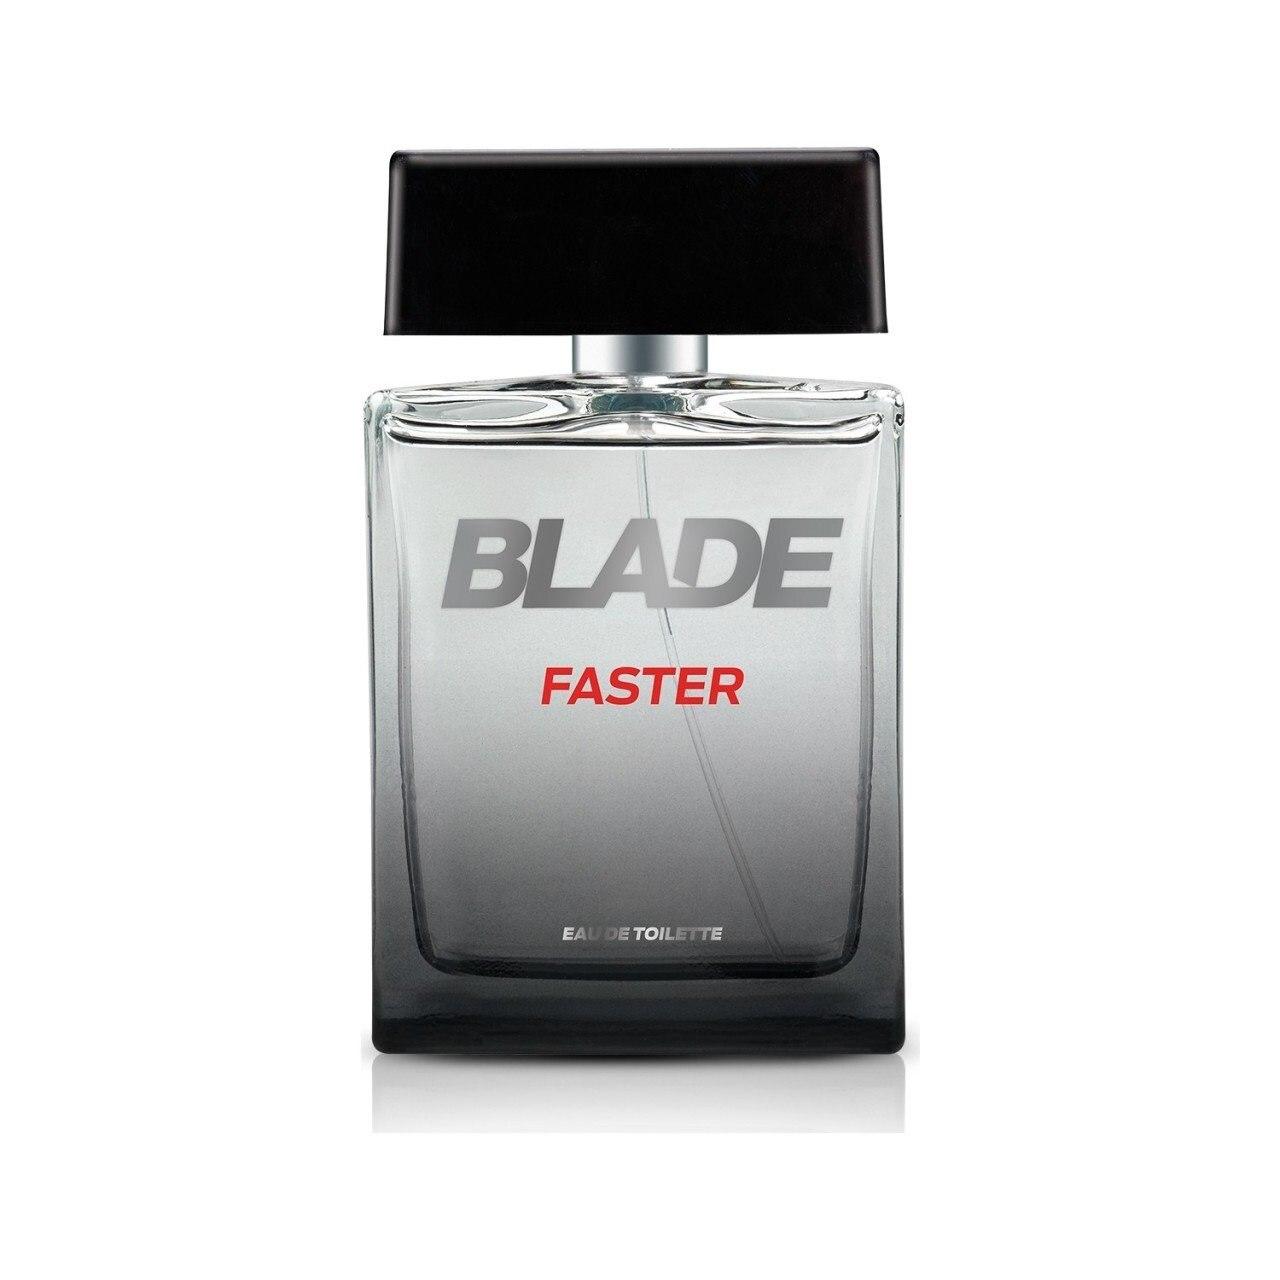 Orjinal Men Parfum Men's Perfume Lasting Fragrance Men Flower Aroma Perfume Essence Oil Body Odor Removal For Turkey